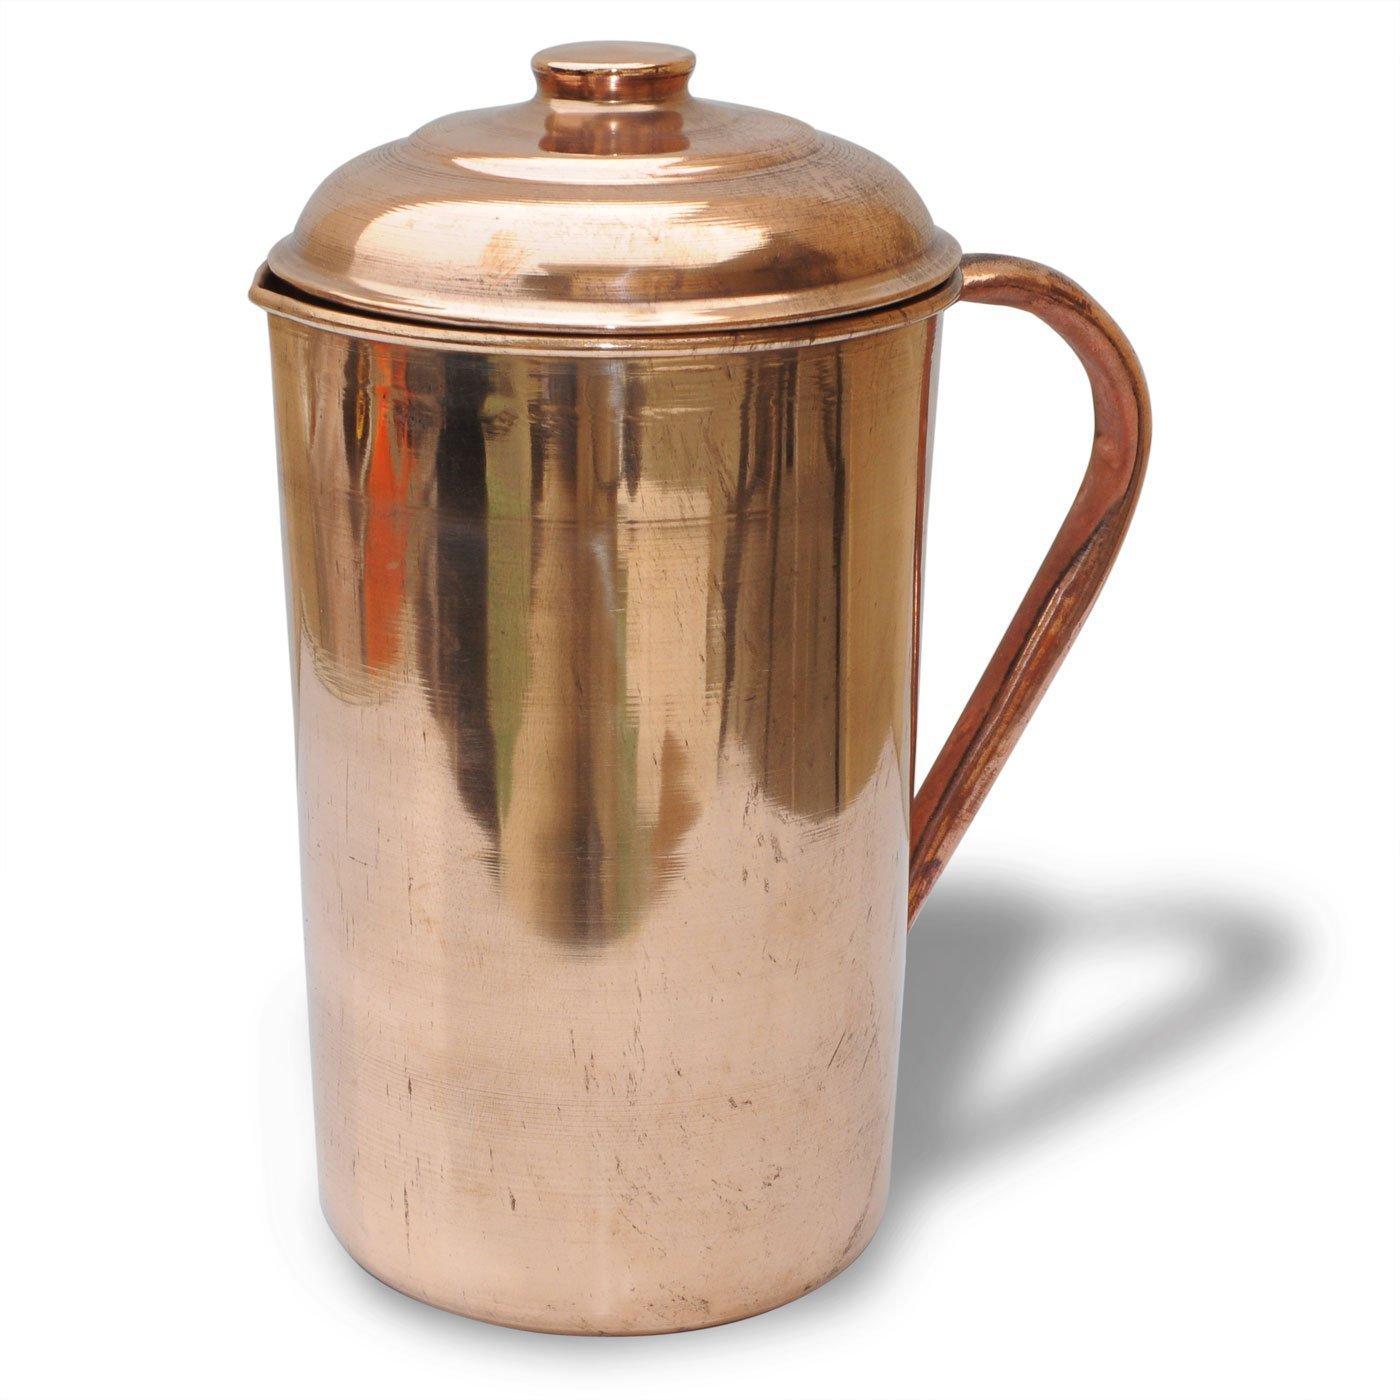 amazoncom dakshcraft copper pitcher jug home  kitchen -